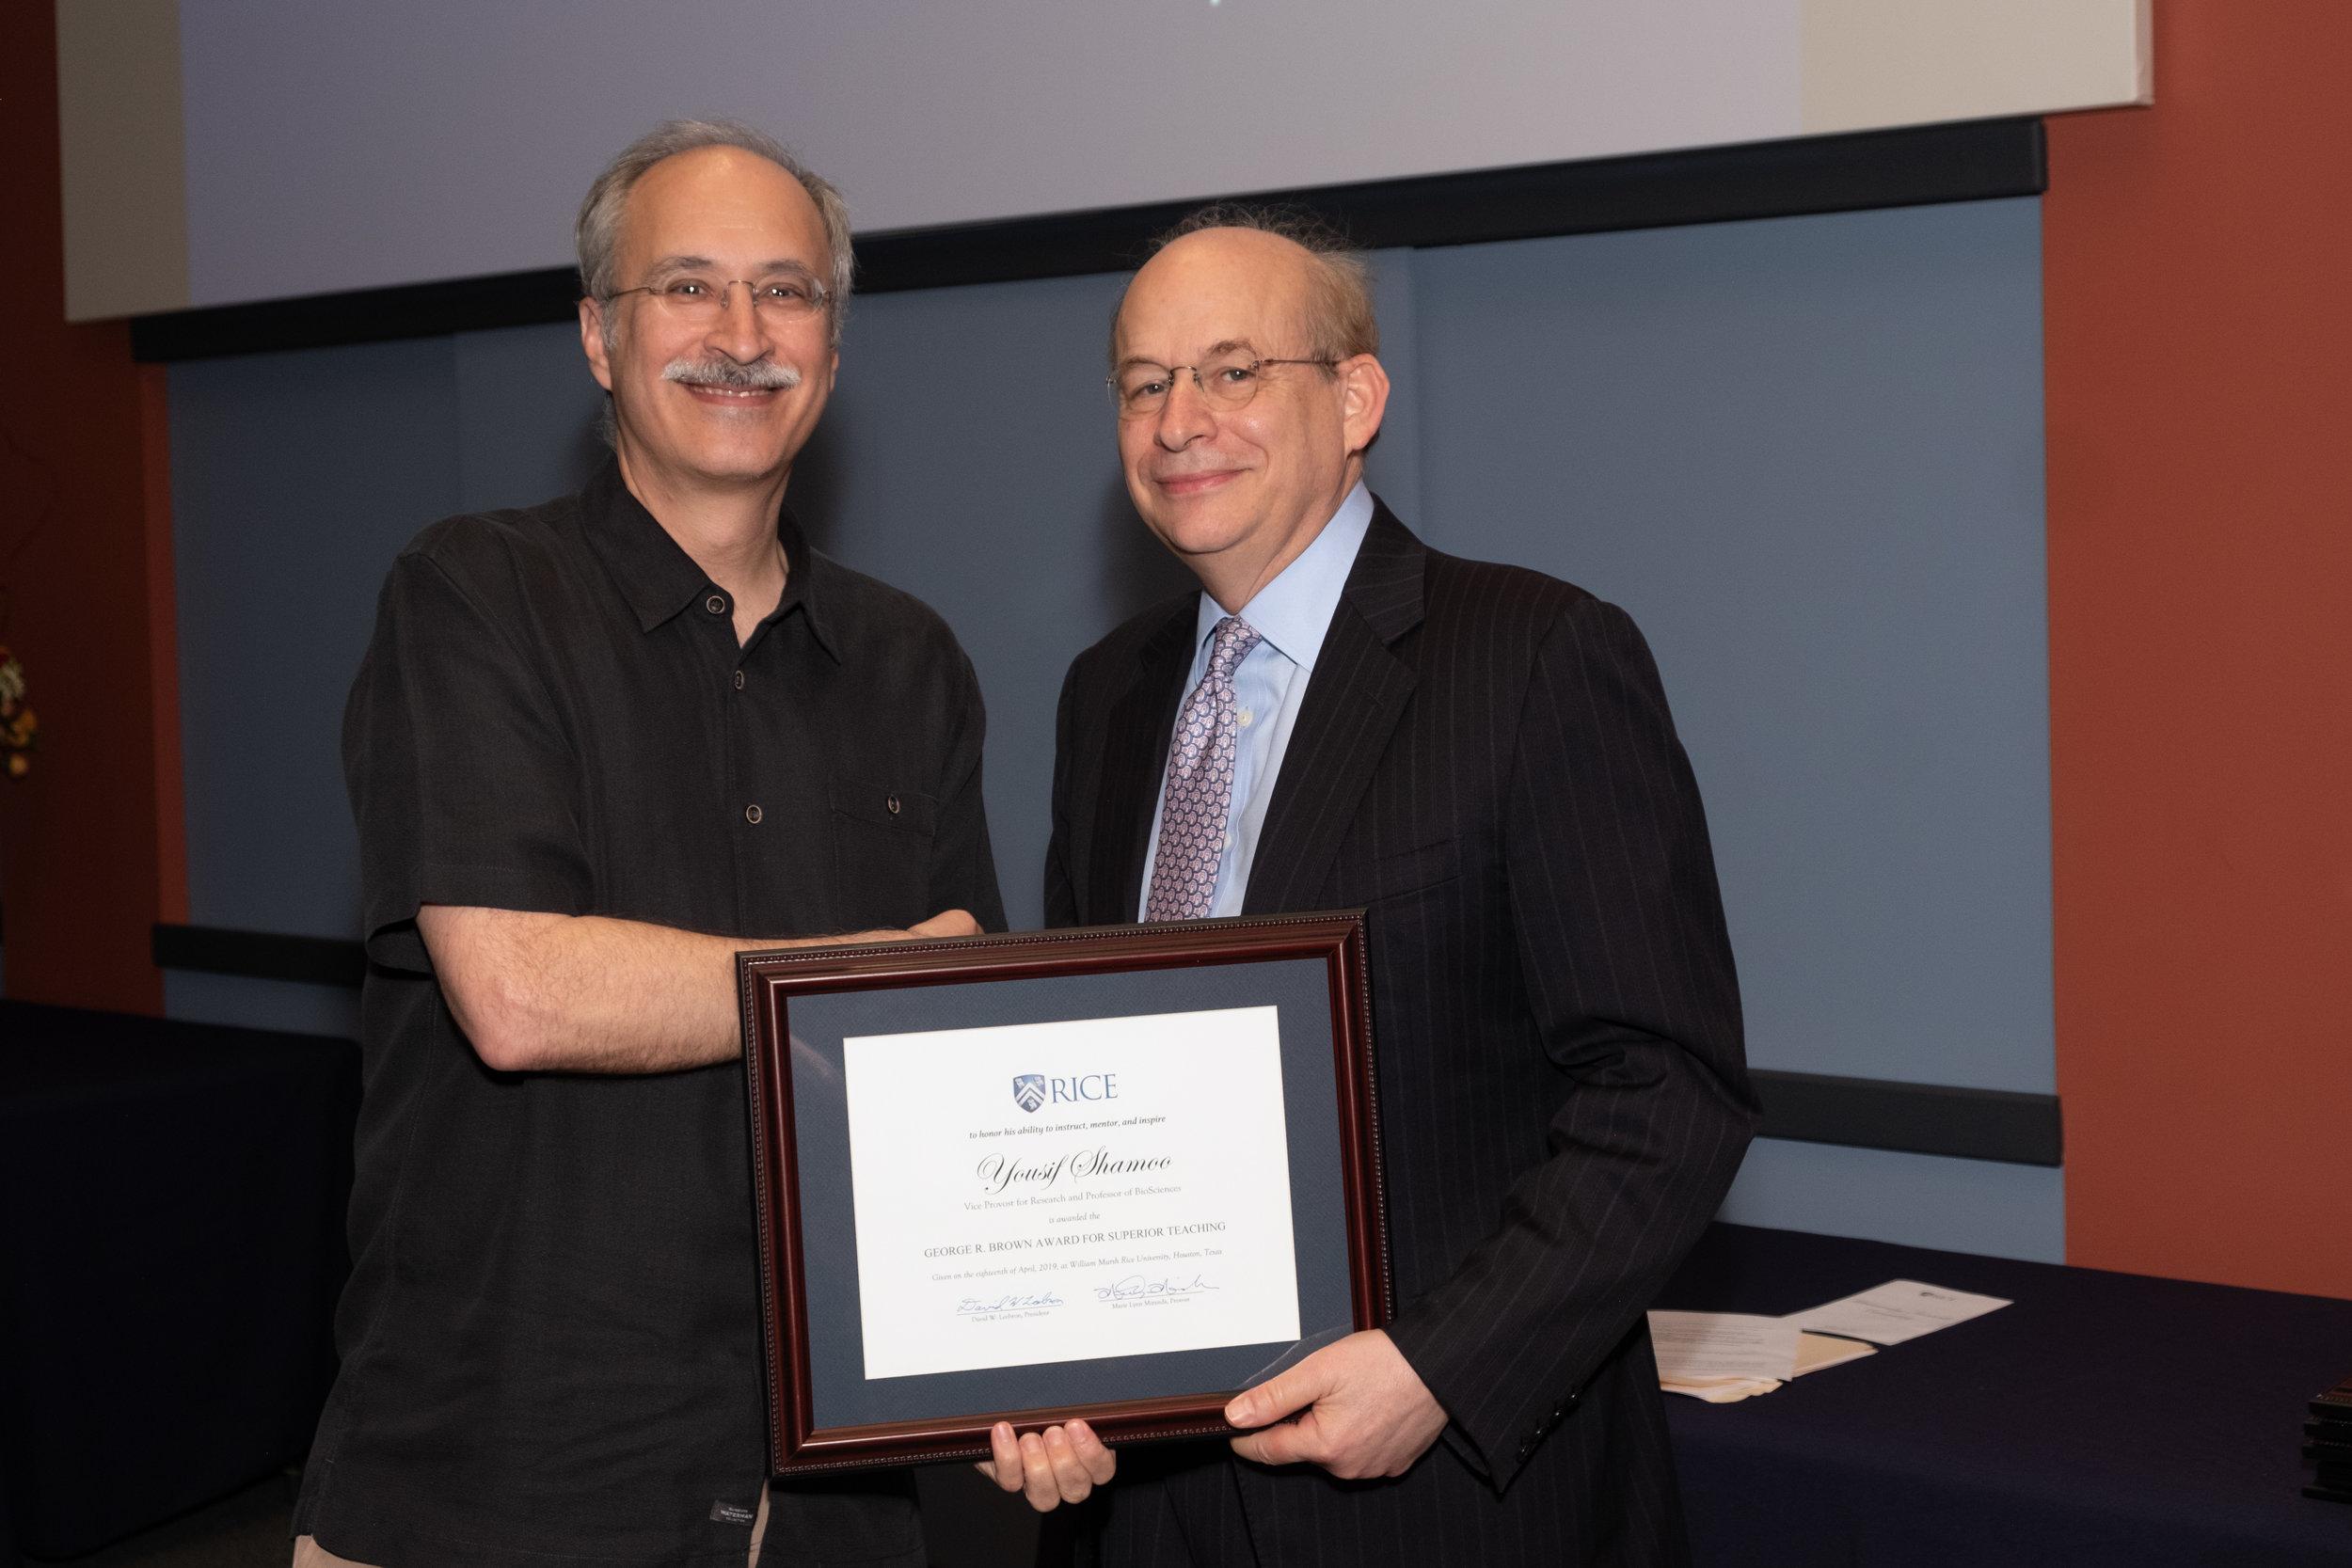 President Leebron & Yousif Shamoo, George R. Brown Award for Superior Teaching